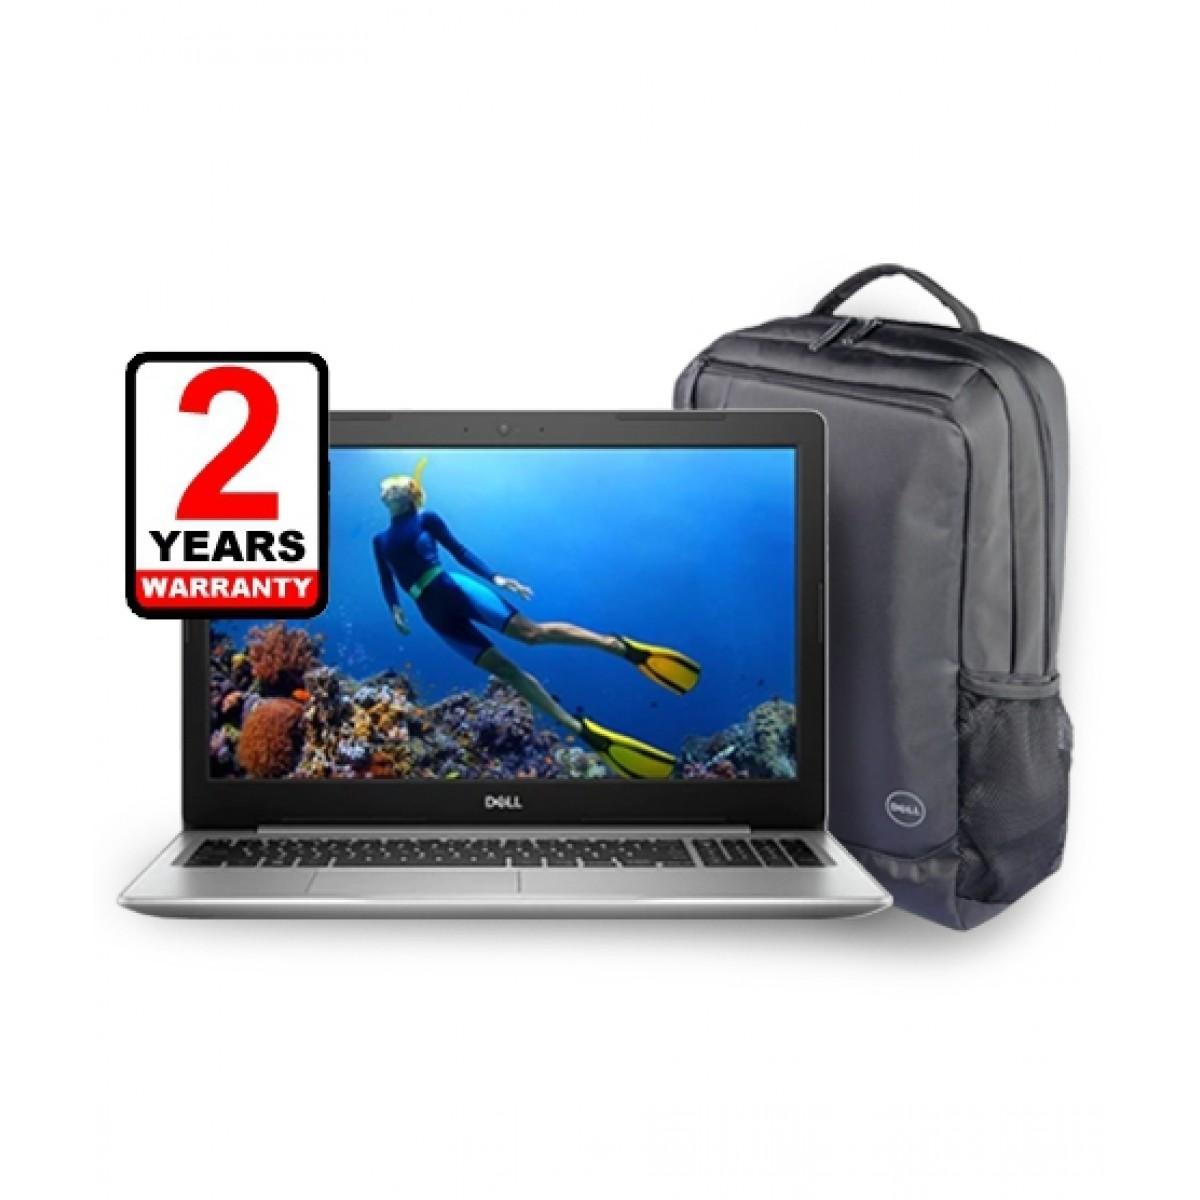 1ec8a743597 Dell Inspiron 15 Core i5 8th Gen Laptop (5570) Price in Pakistan ...